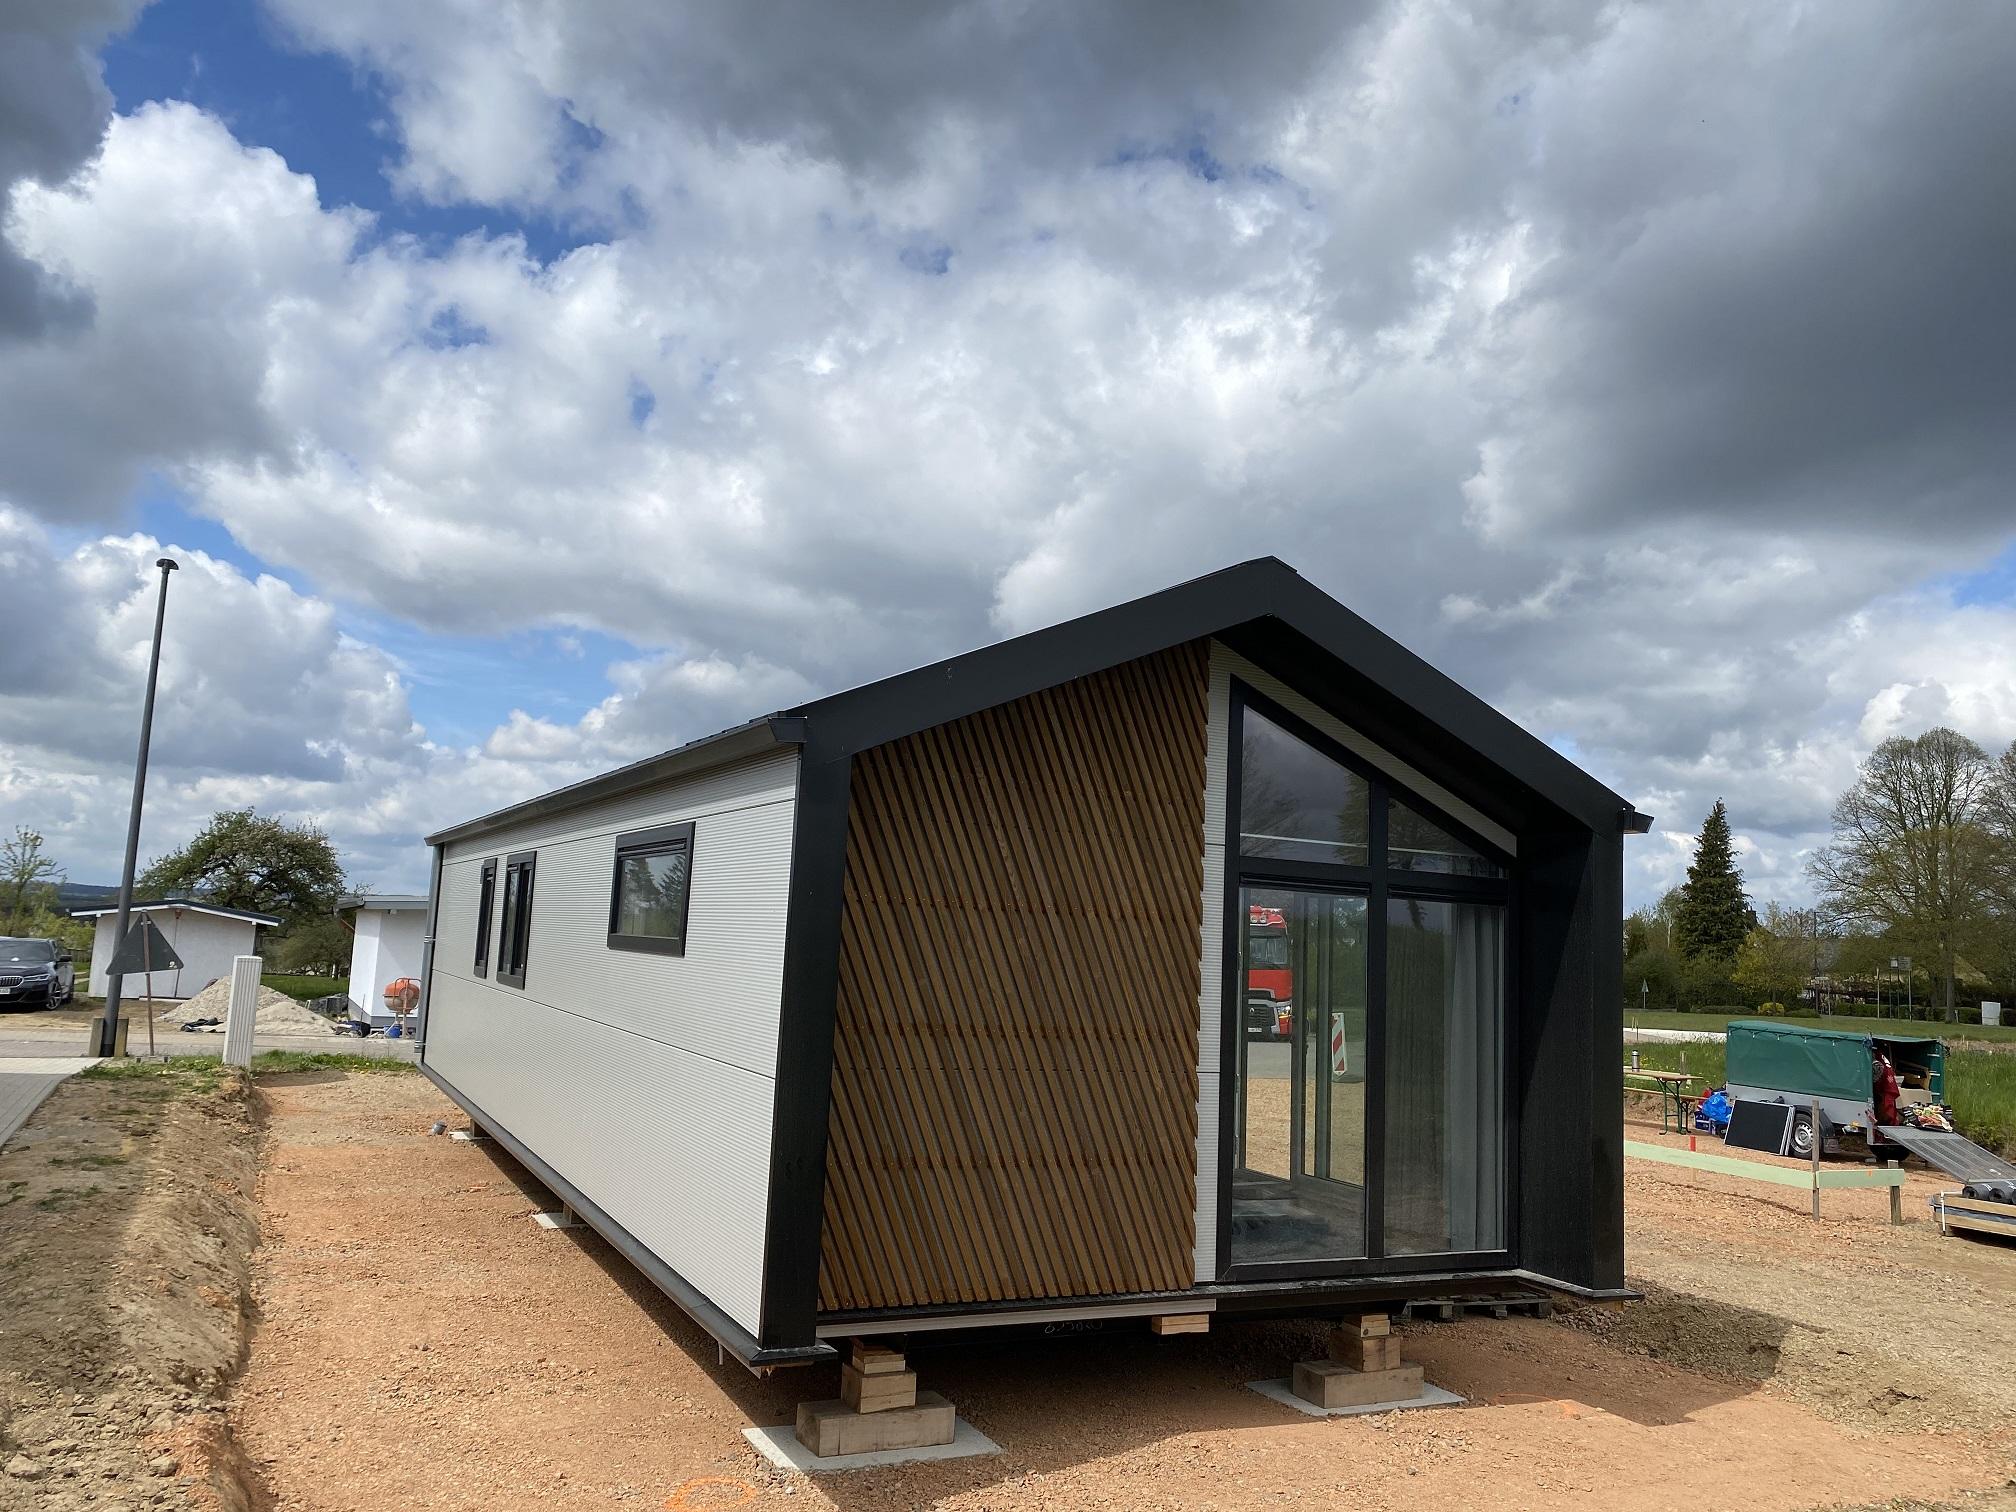 gebaute häuser 05.21-vital camp gmbH 05